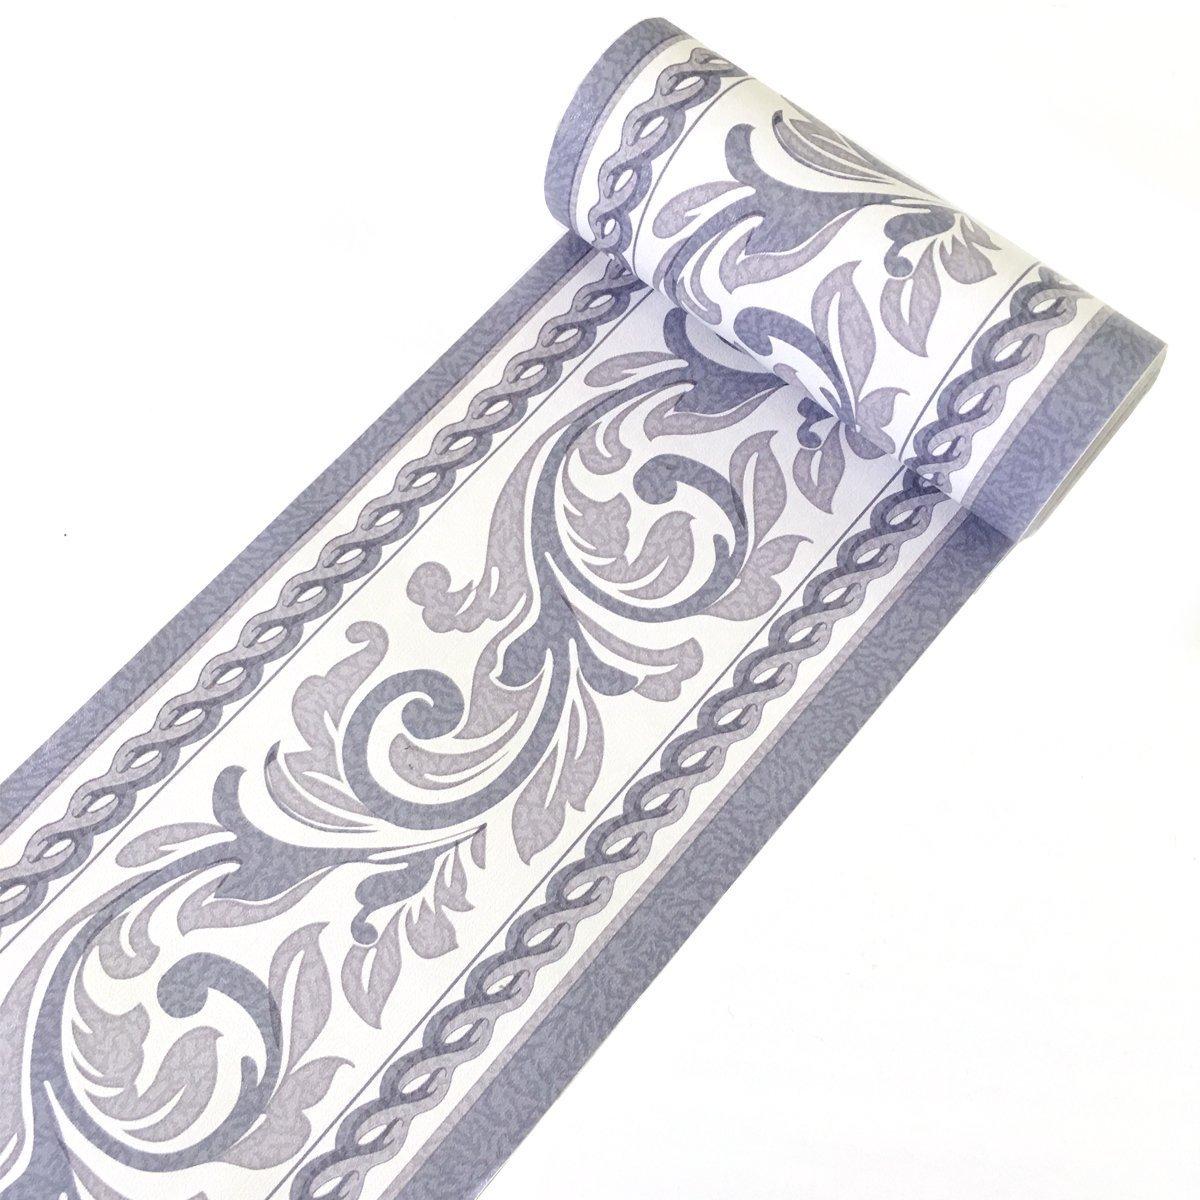 Yifely Moistureproof PVC Wallpaper Border Peel & Stick Scroll Wall Borders Sticker Home Decor